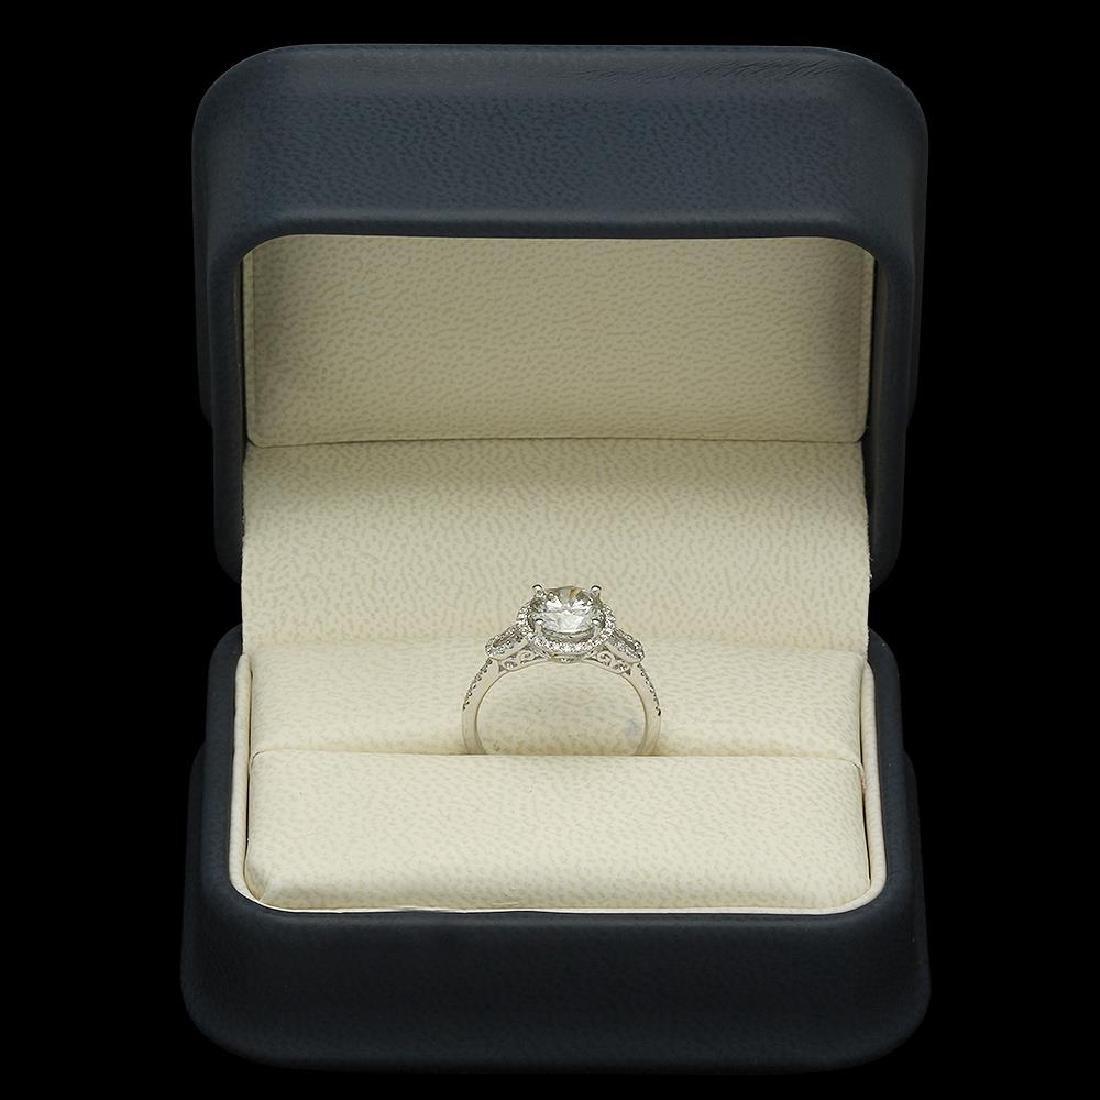 14K Gold 1.79ct Diamond Ring - 4